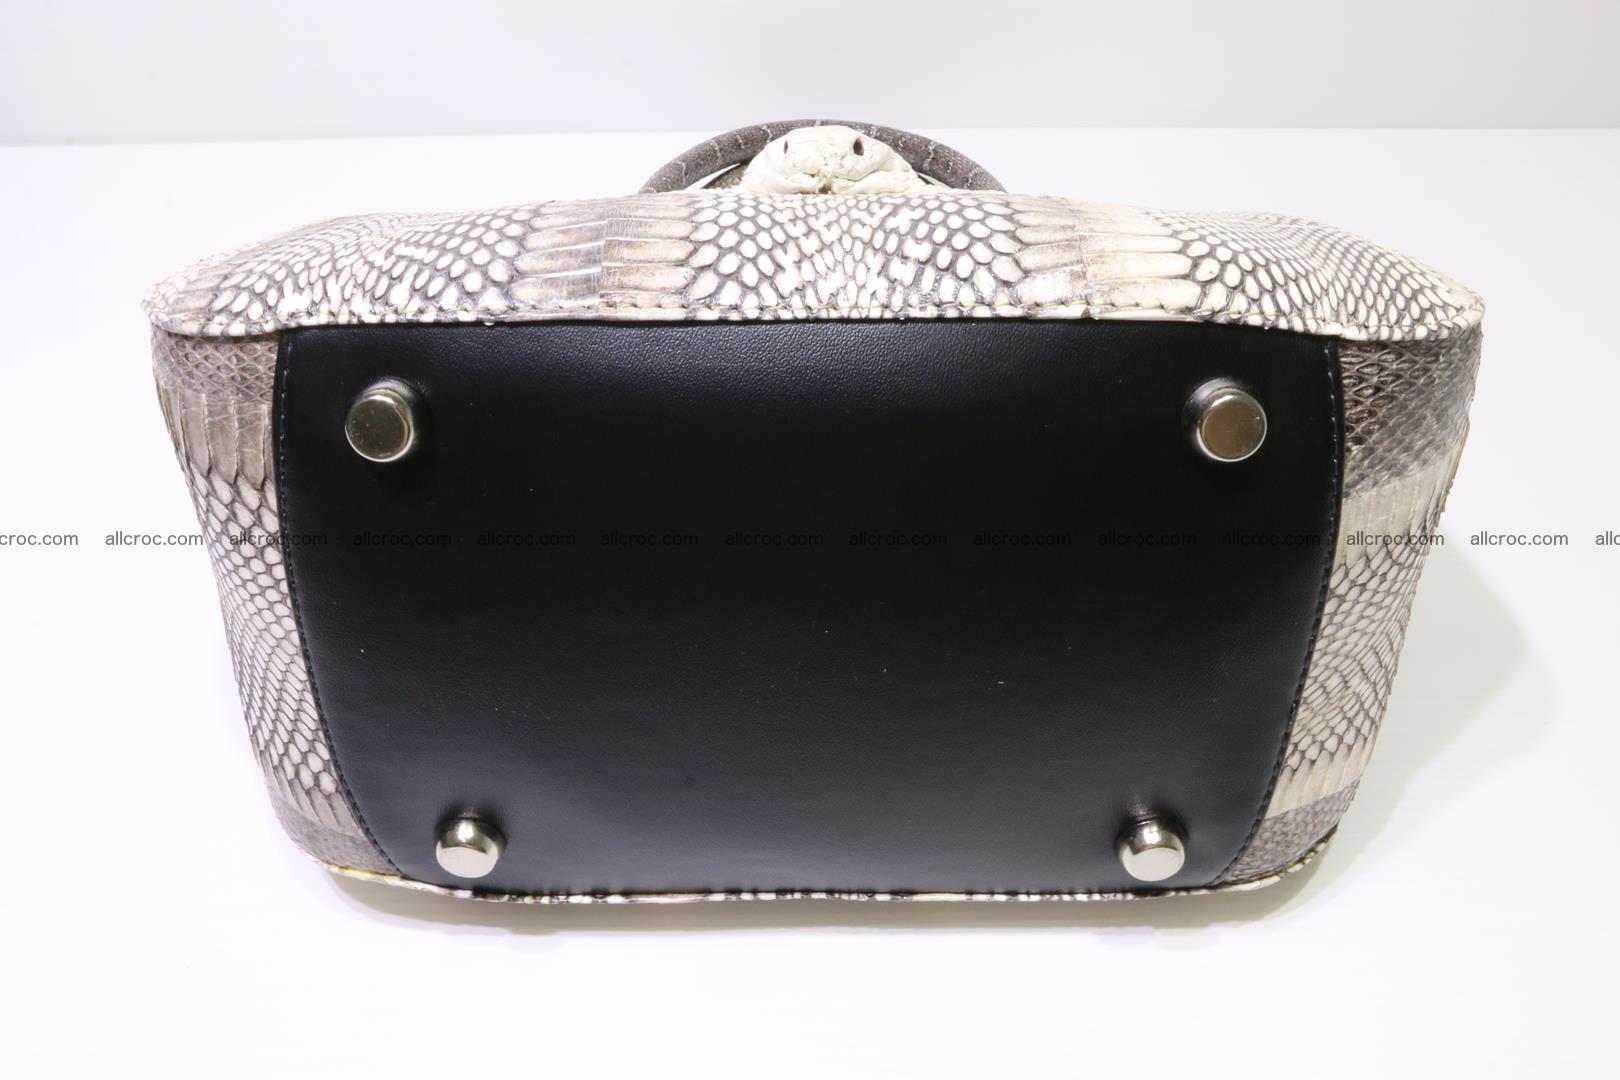 Cobra skin ladies handbag with head of cobra 193 Foto 9